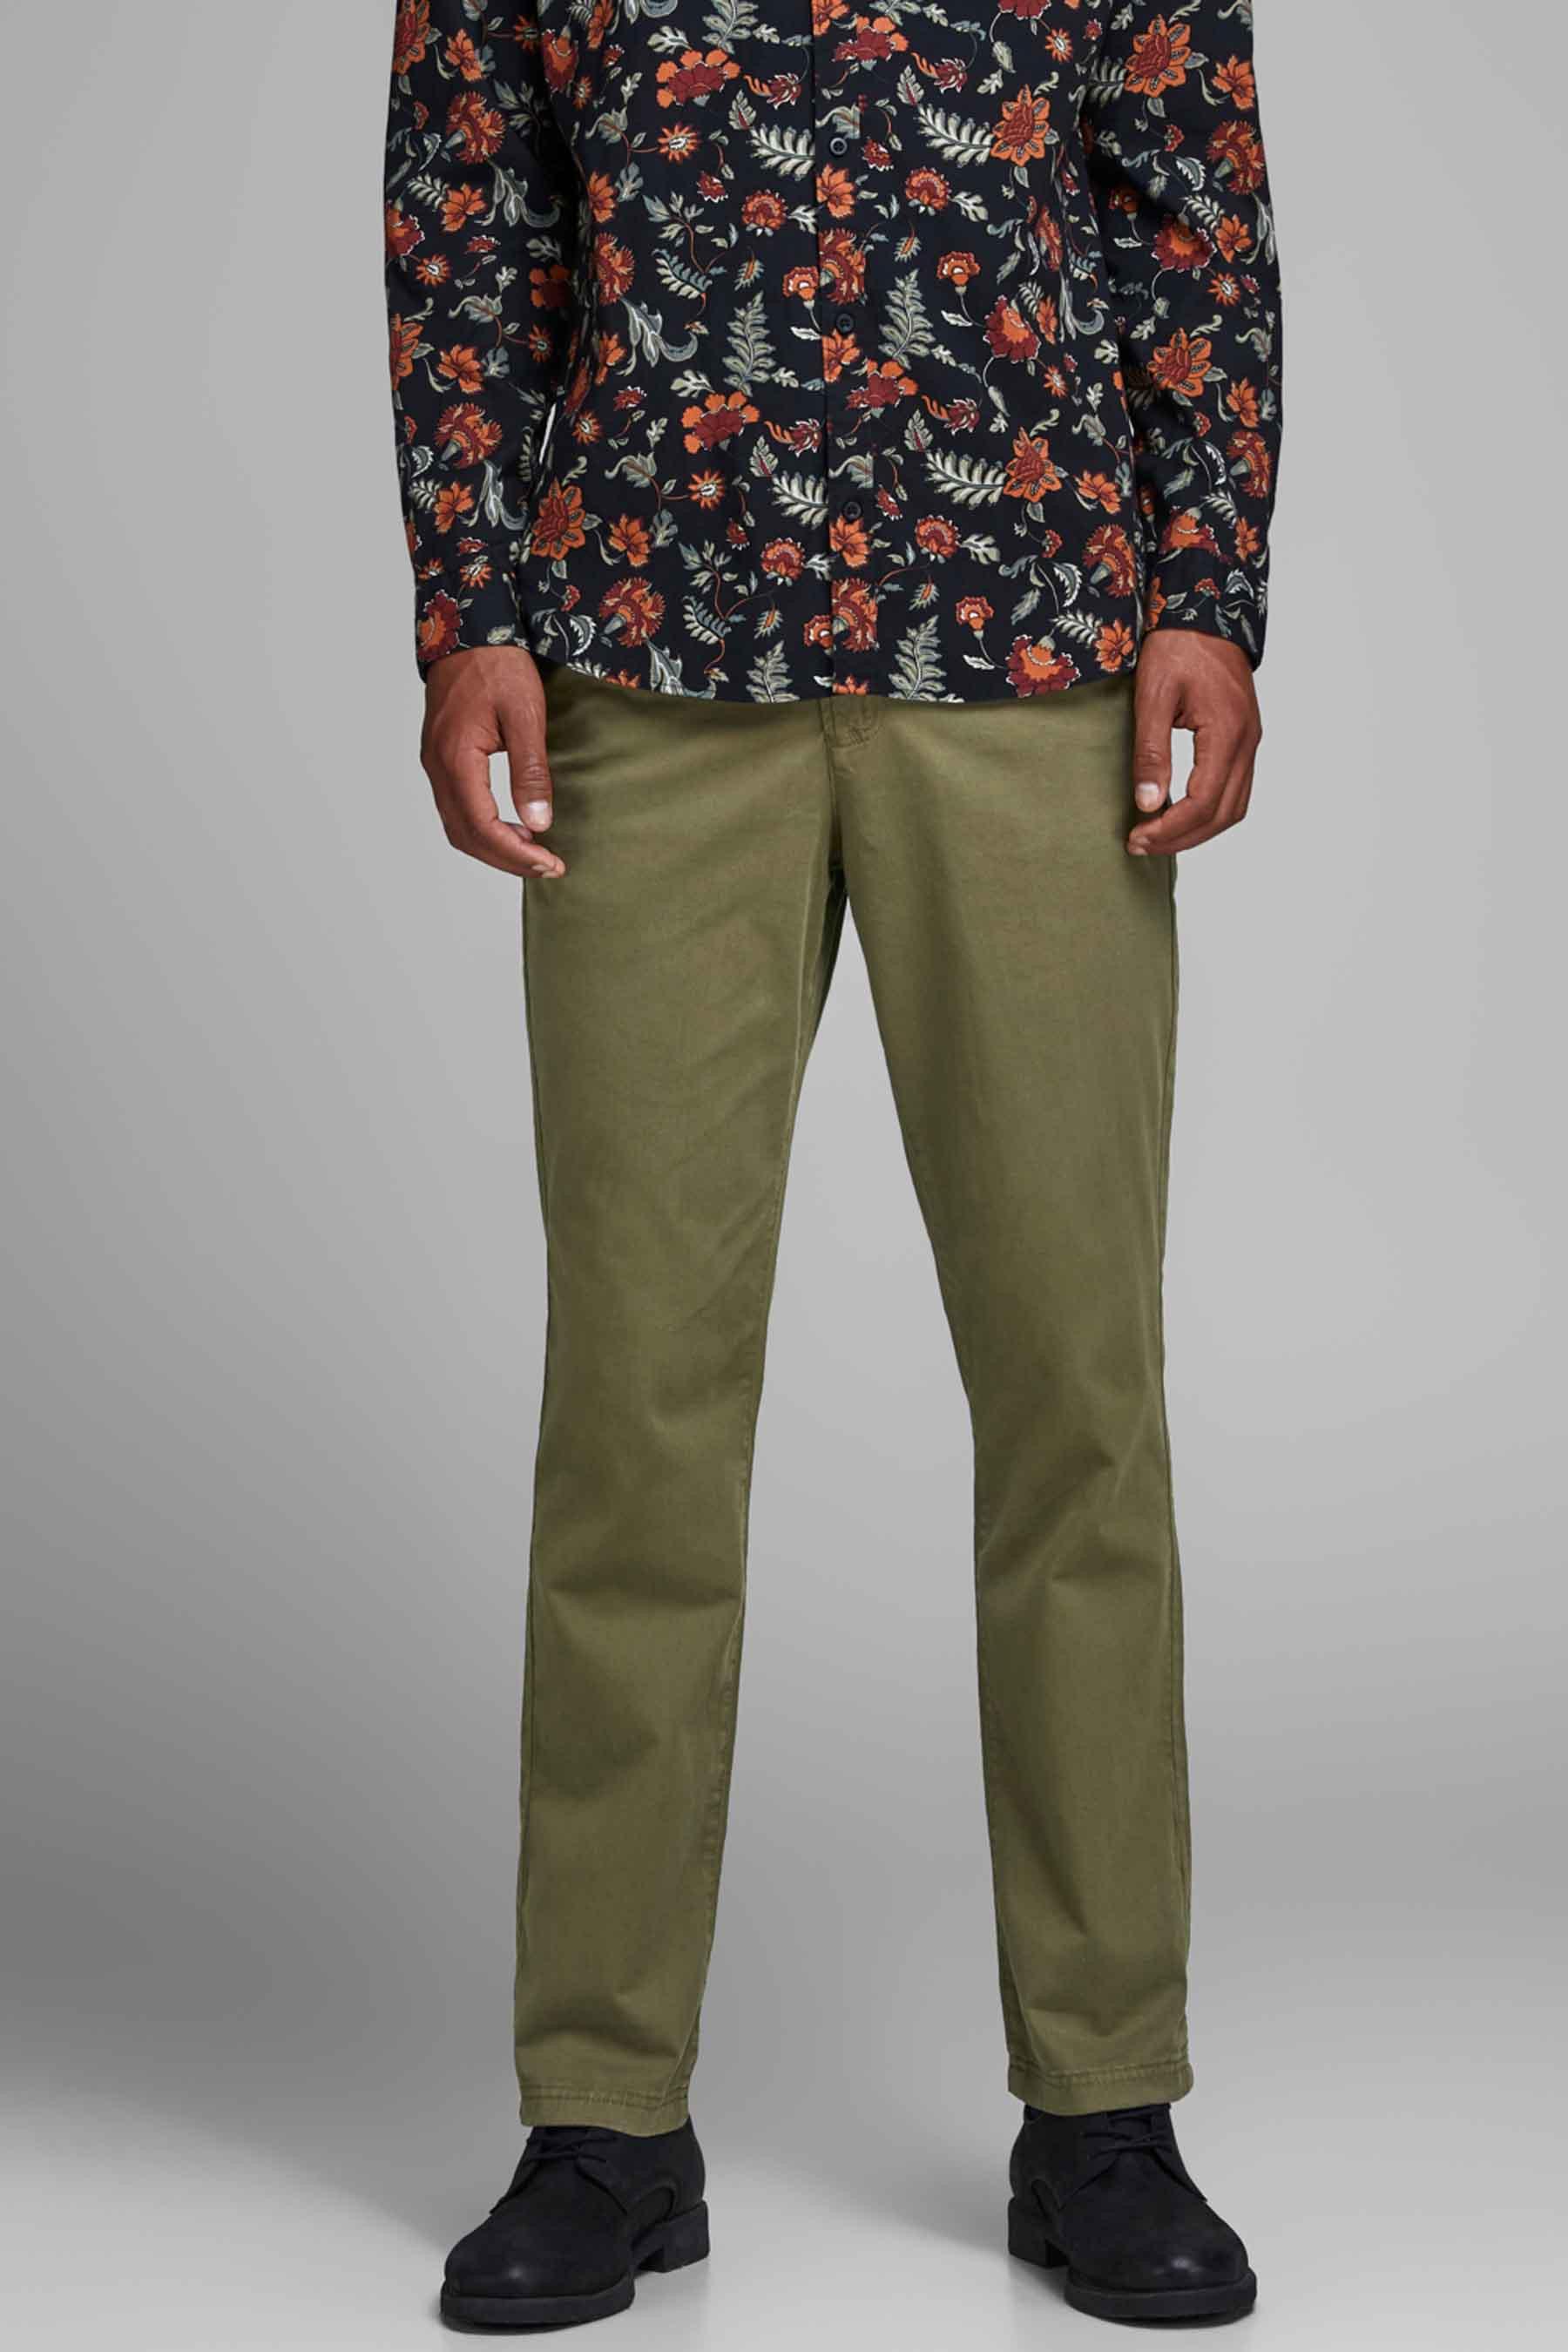 Jack & Jones Jeans Intelligenc Chino, Olive, Heren, Maat: 27x32